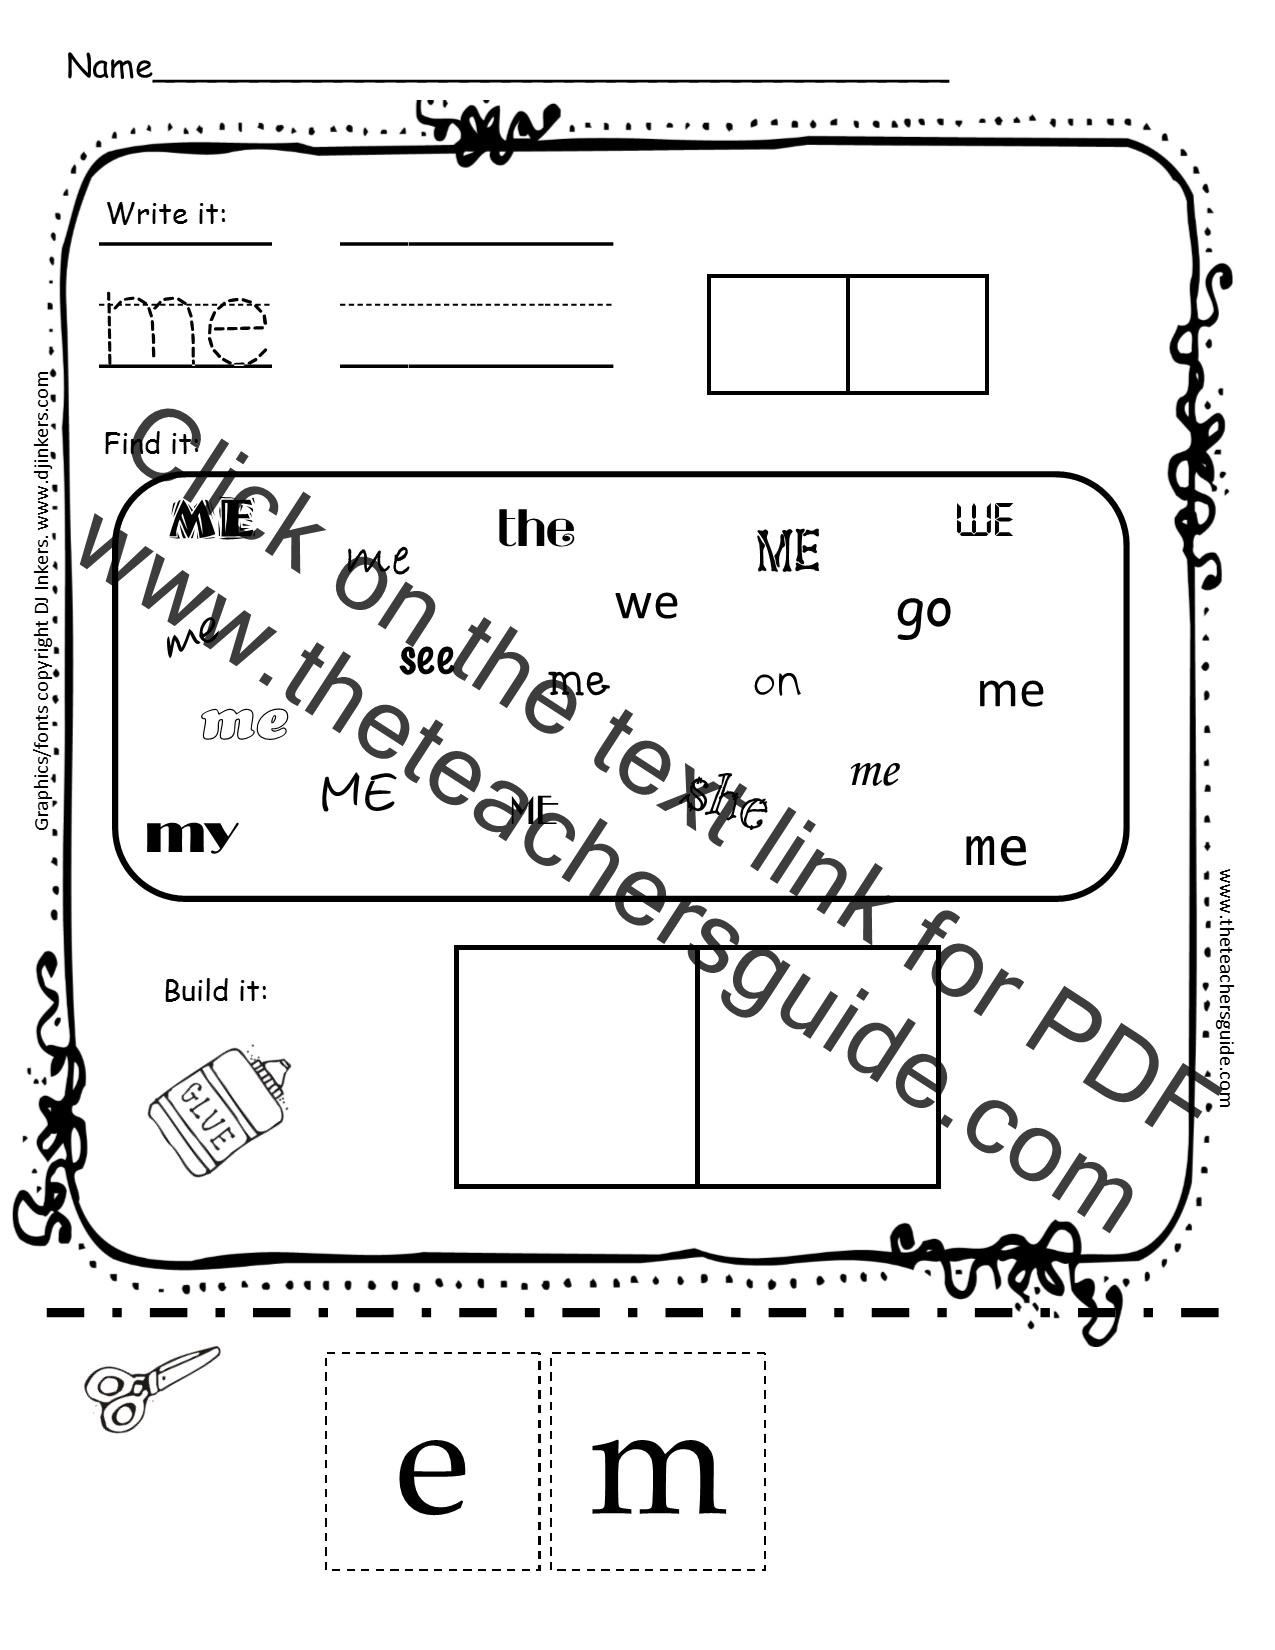 kindergarten sight word printouts from the teacher u0026 39 s guide